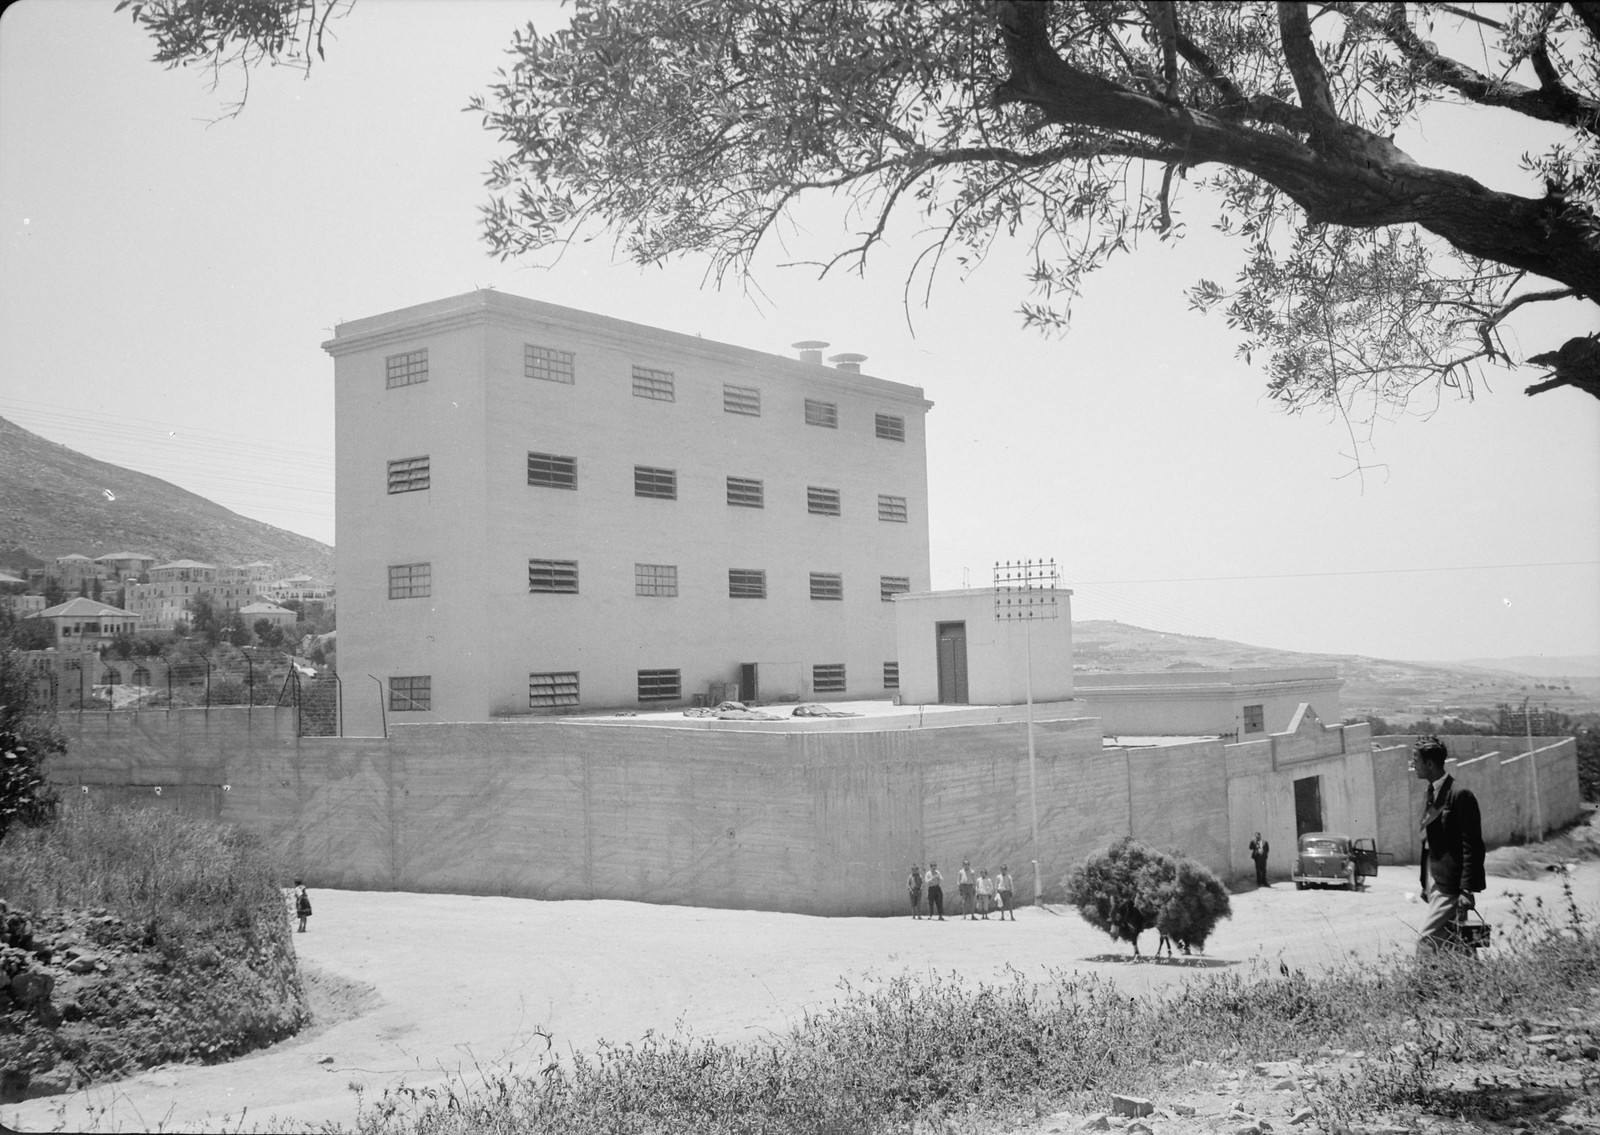 07. 1940. Шхем. The Naameh Flour Mills Ltd. Общий вид